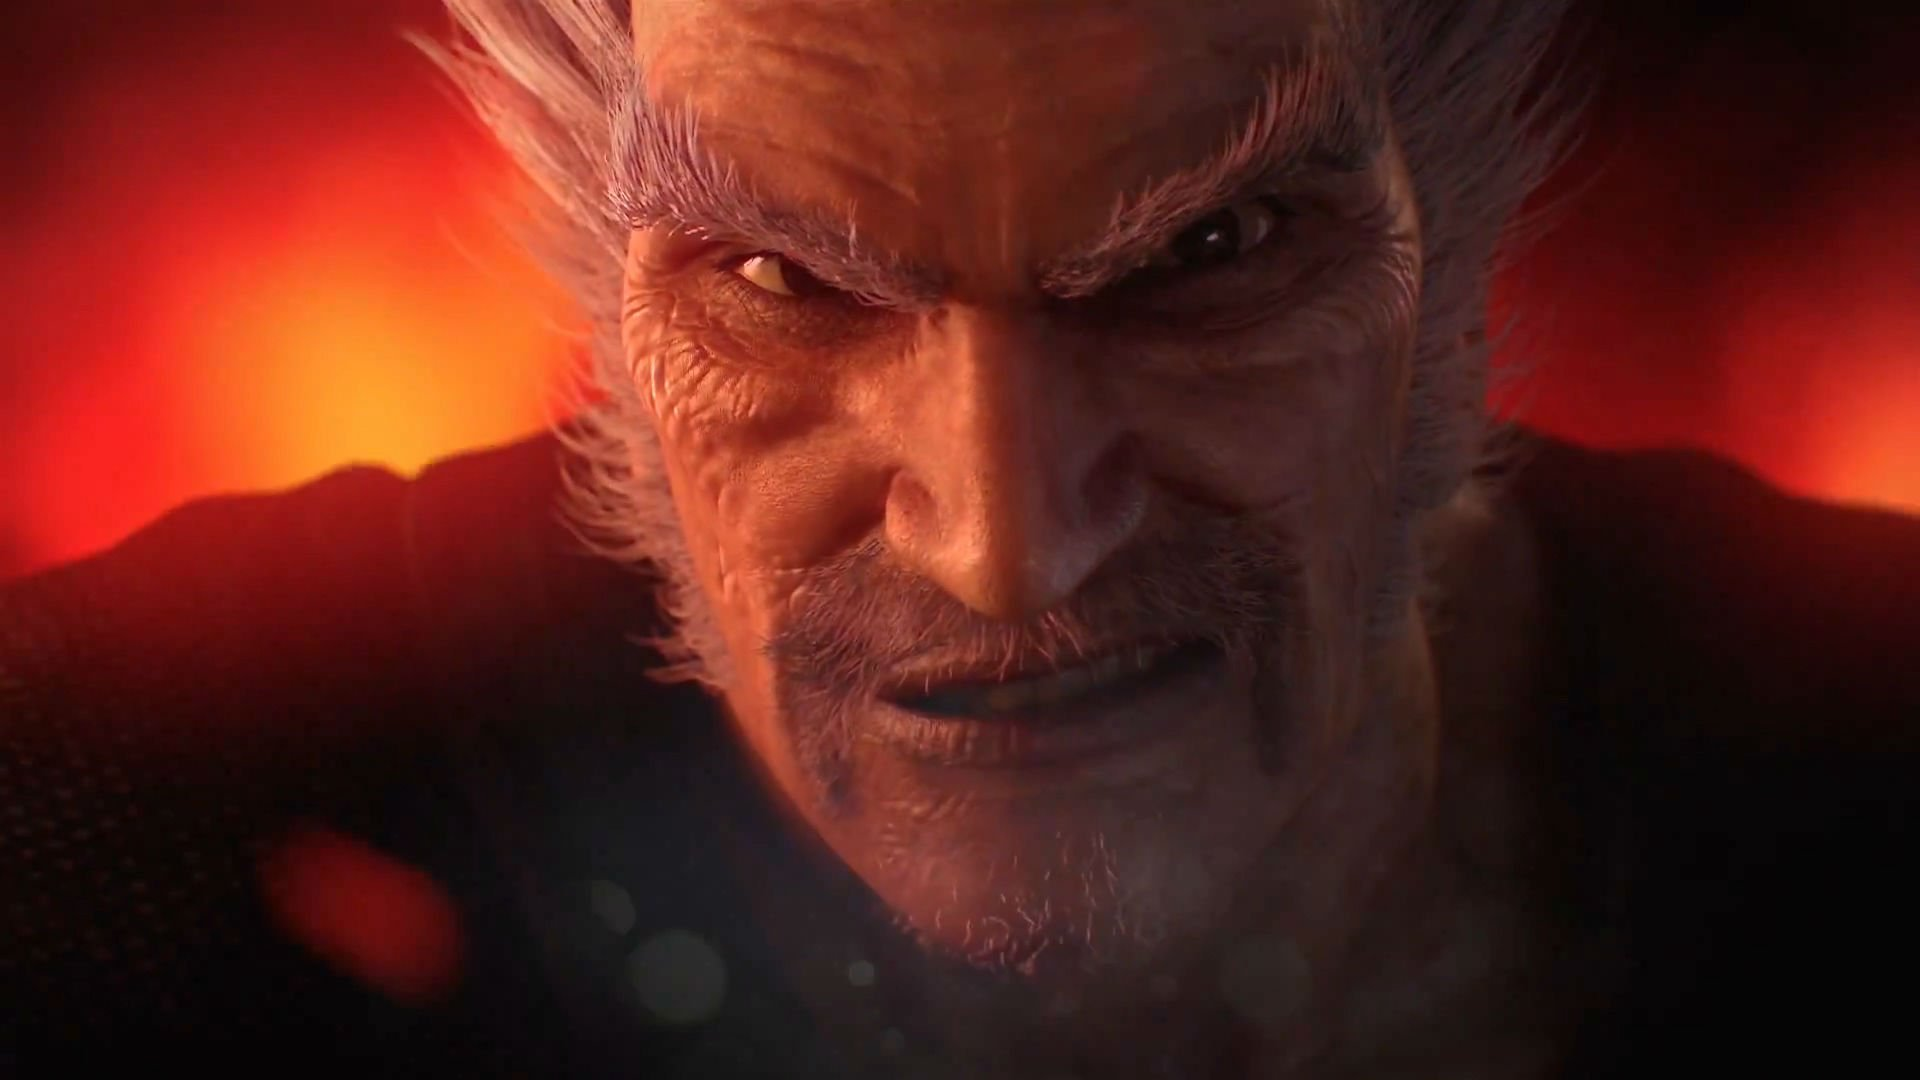 Download Tekken 7 Hd Wallpapers For Free